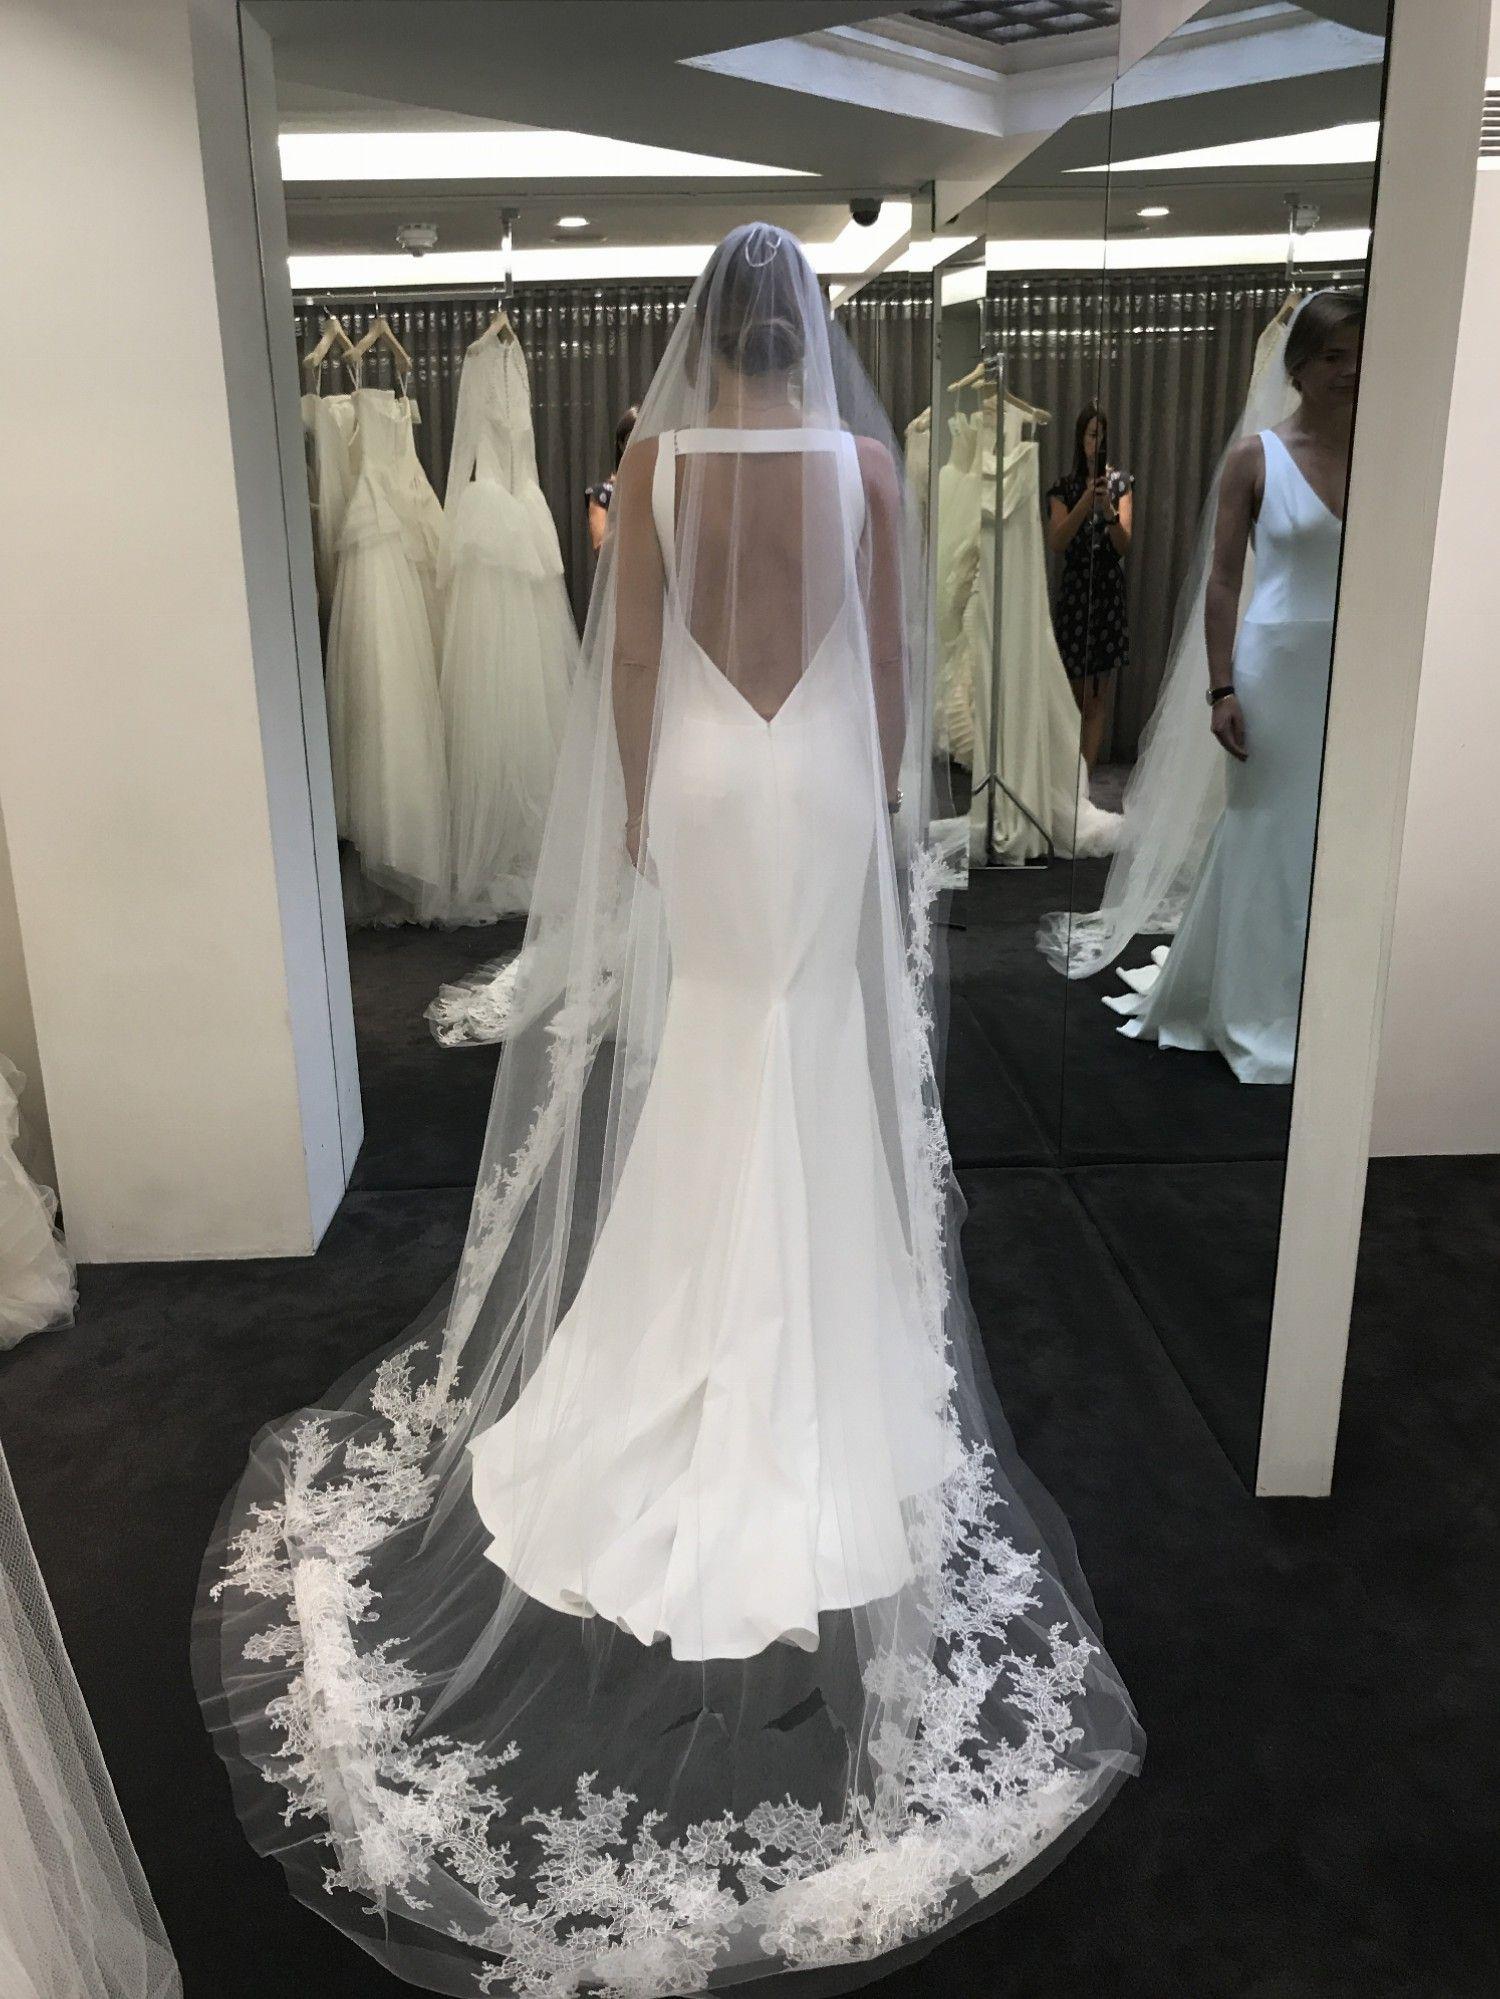 Vera Wang Michaela New Wedding Dress Save 53 Wedding Dresses Vera Wang Ball Gowns Wedding Wedding Dresses [ 1999 x 1500 Pixel ]